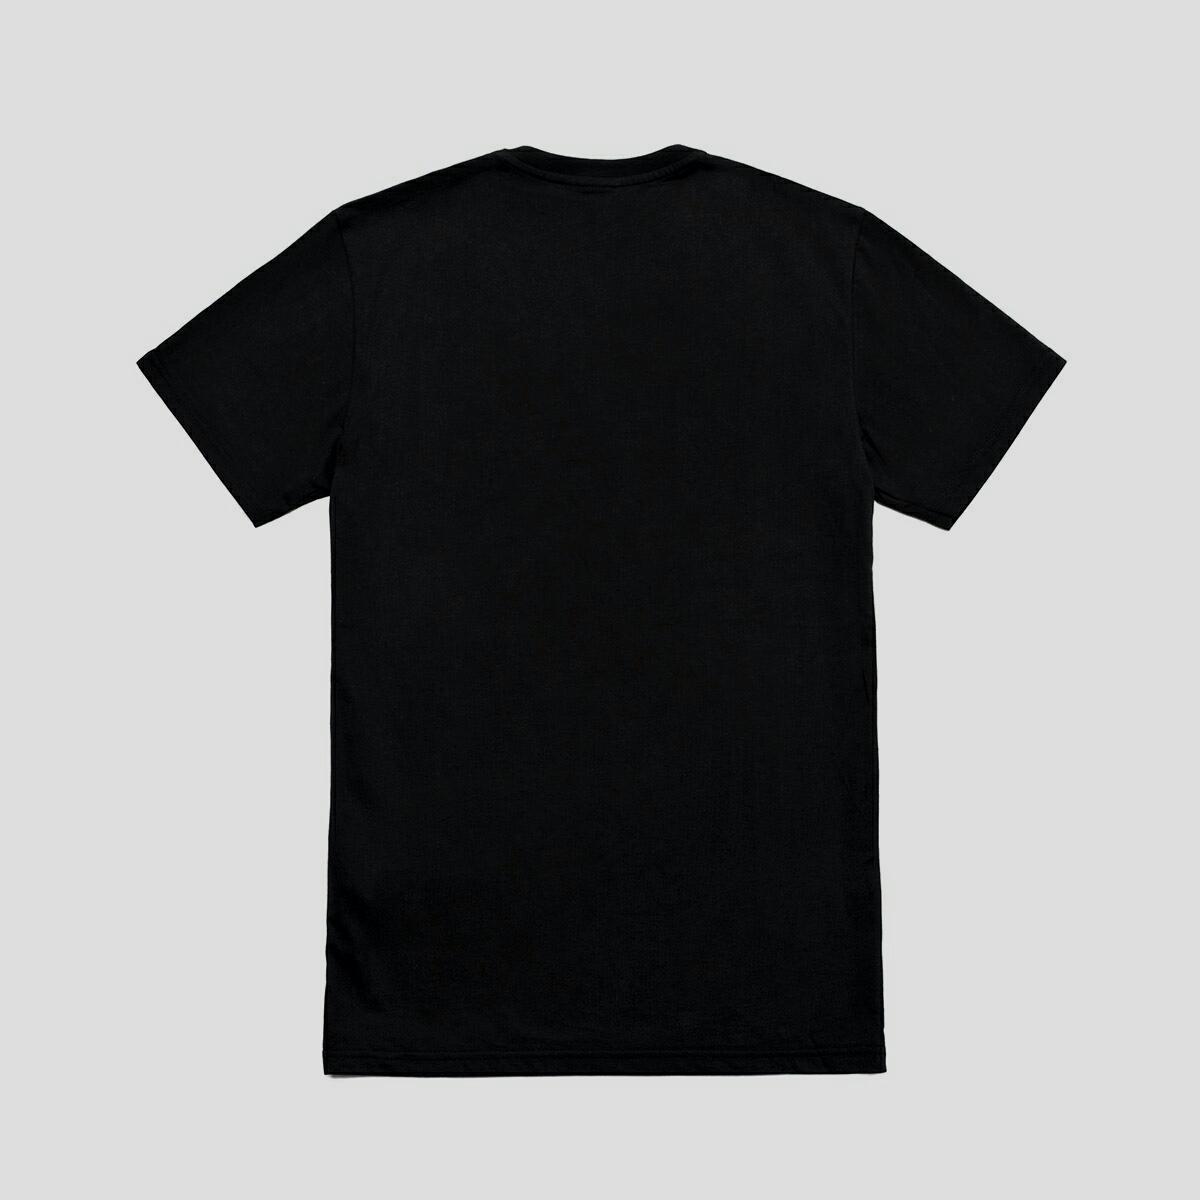 blank t shirt blank template imgflip. Black Bedroom Furniture Sets. Home Design Ideas